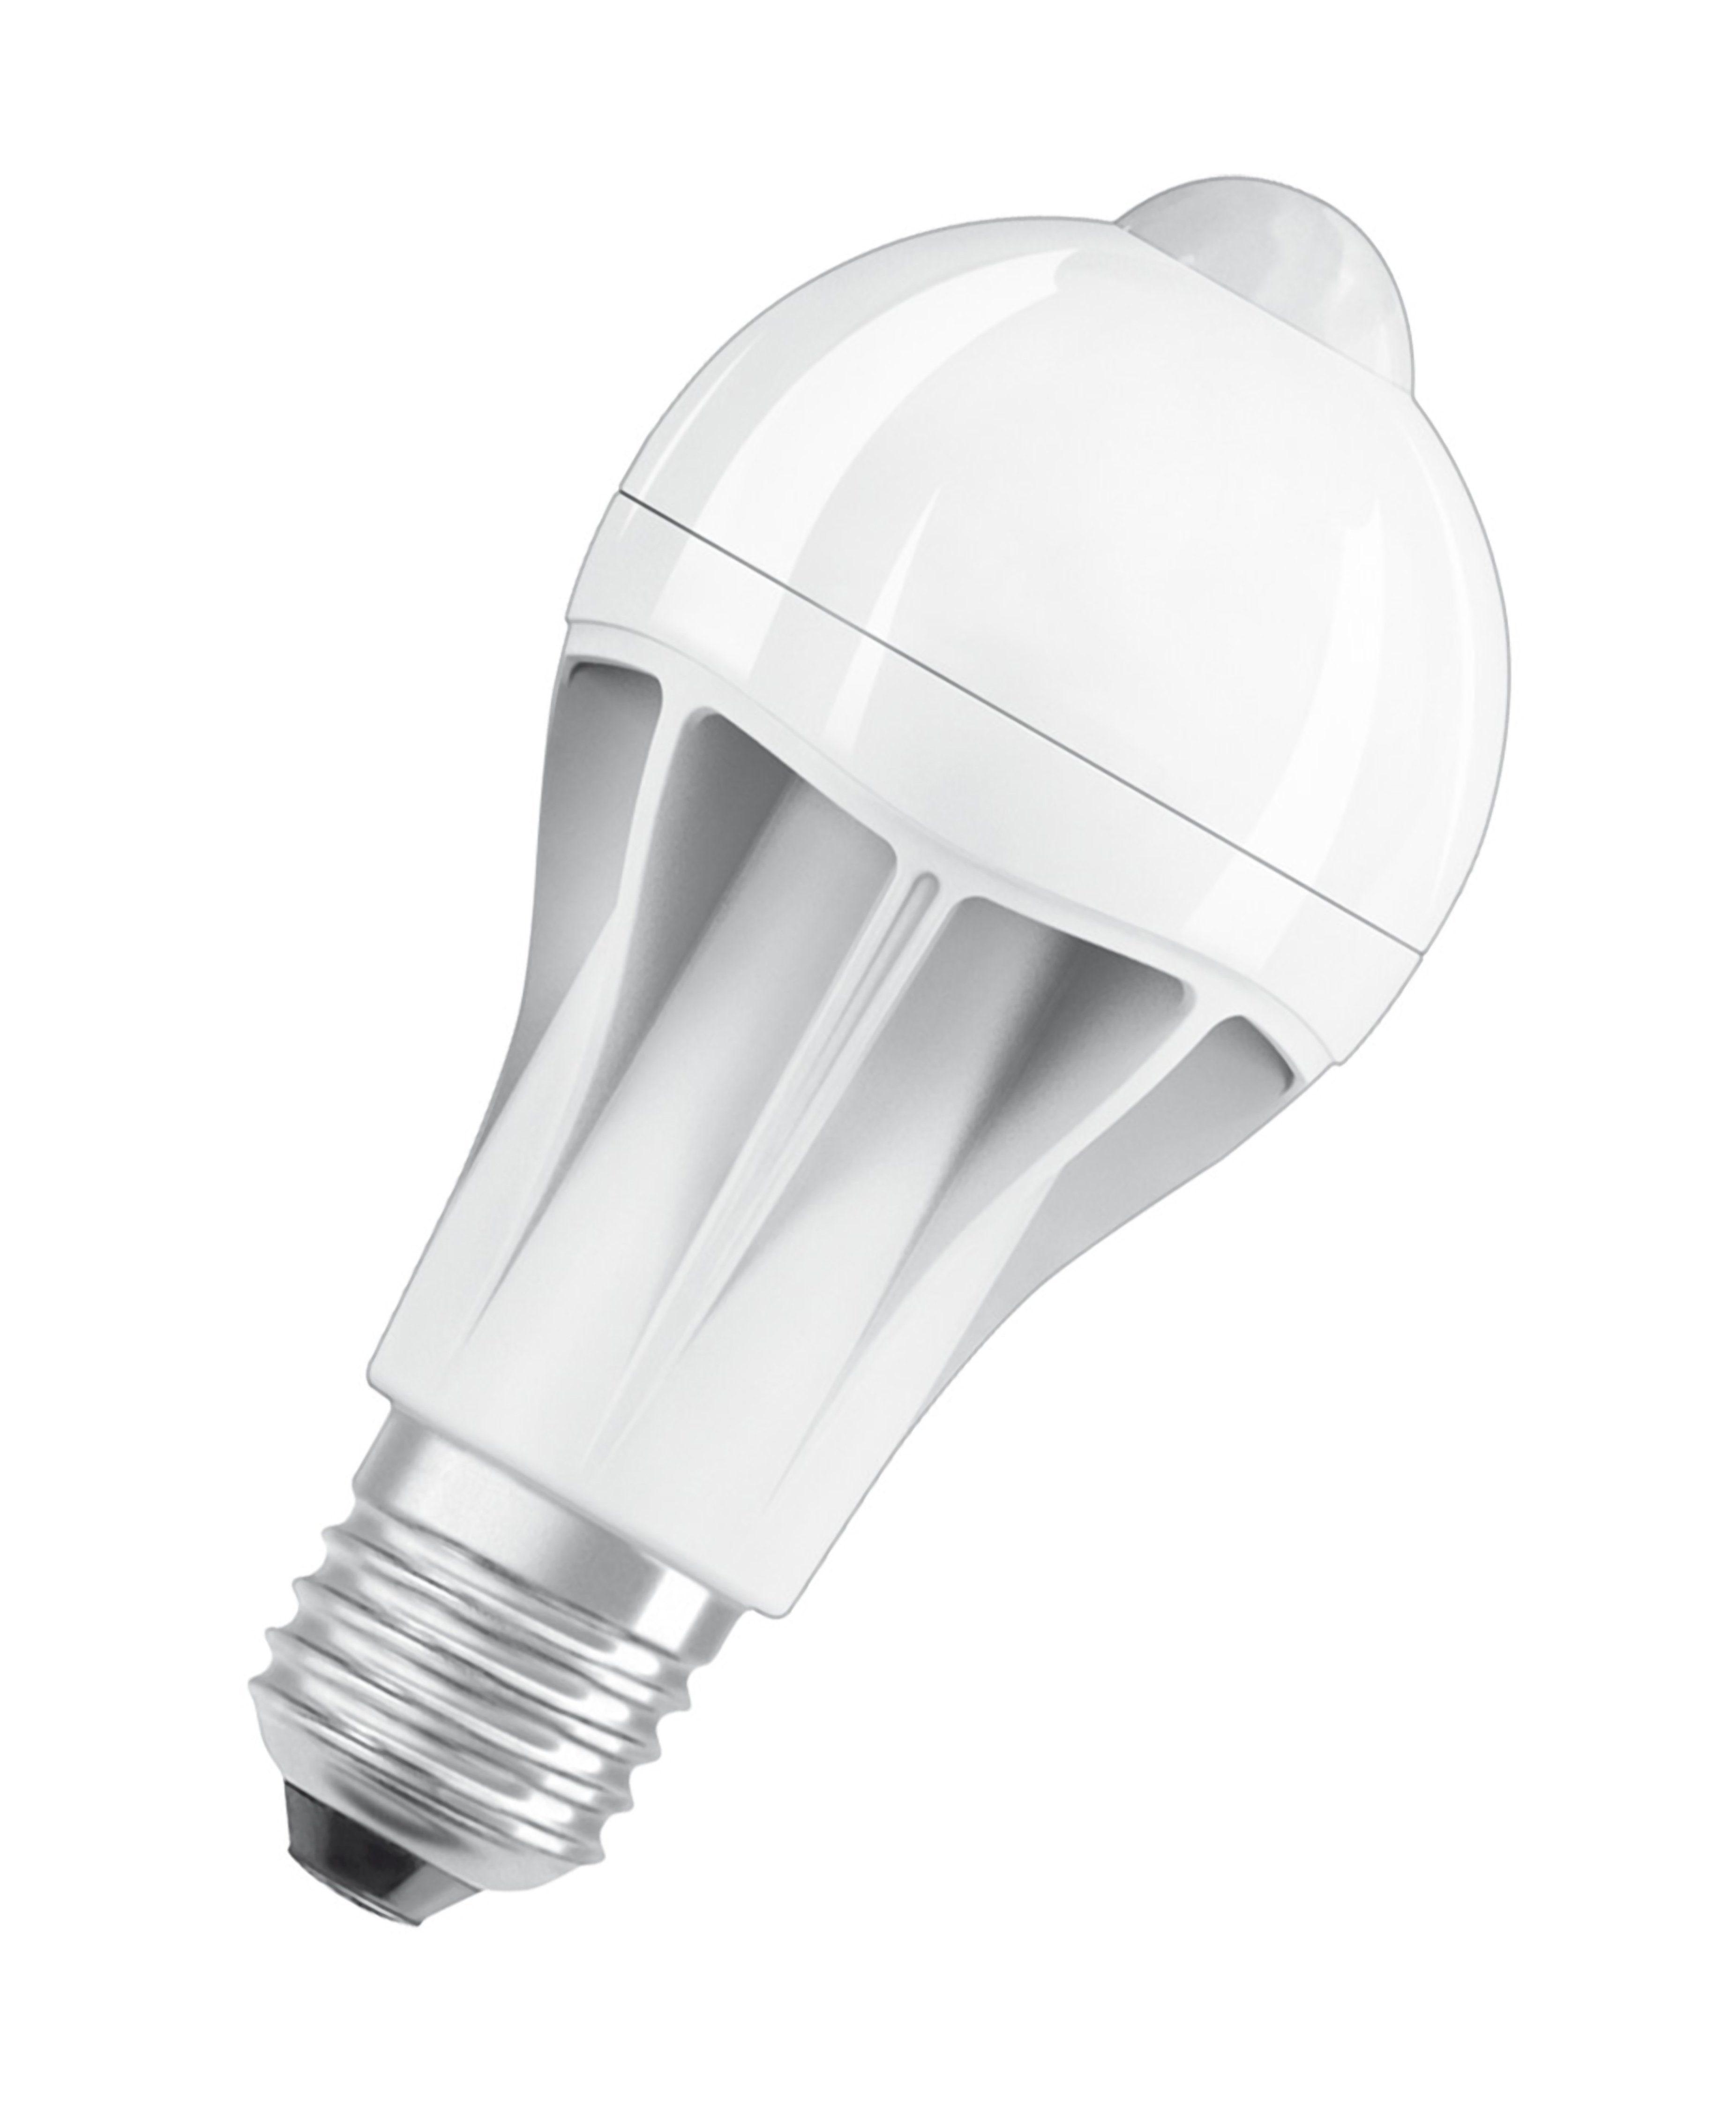 Osram LED STAR MOTION SENSOR CLASSIC A - LED-Lampe, Bewegungssensor »ST CLAS A 75 11.5 W/827 E27«